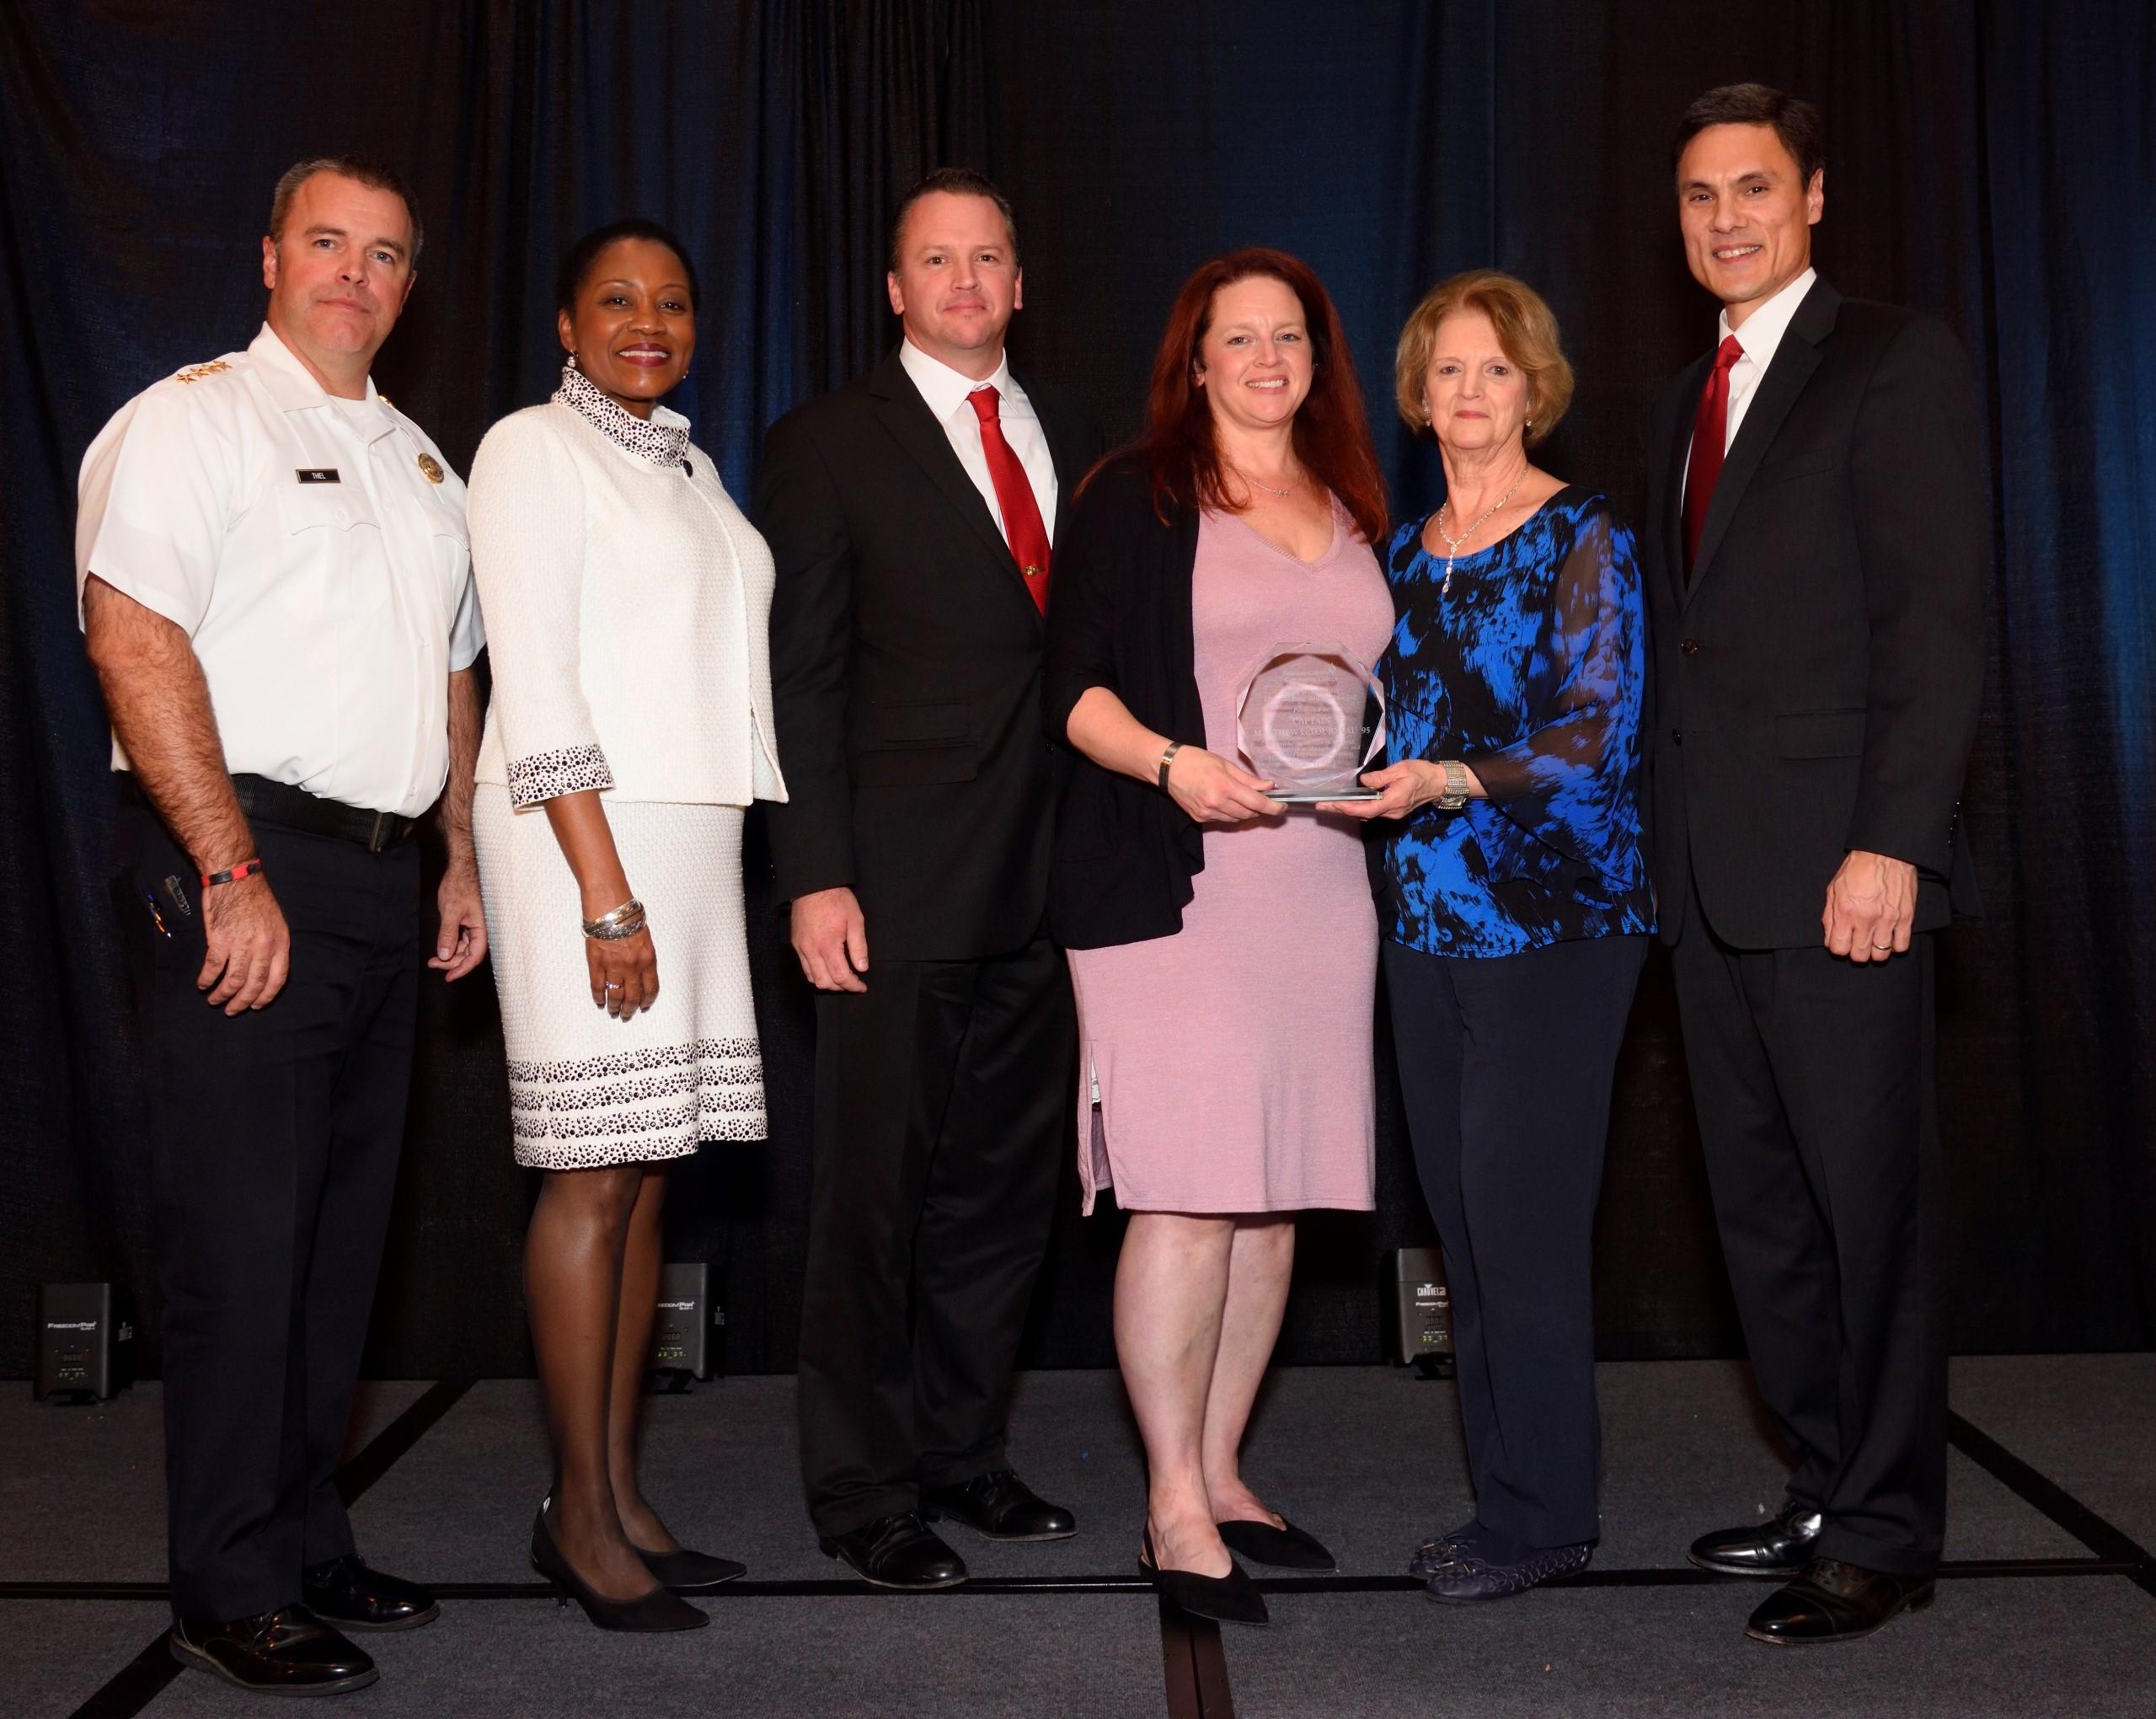 Delaware County Community College Bestows Highest Alumni Honor on Instructor, Fallen Firefighter